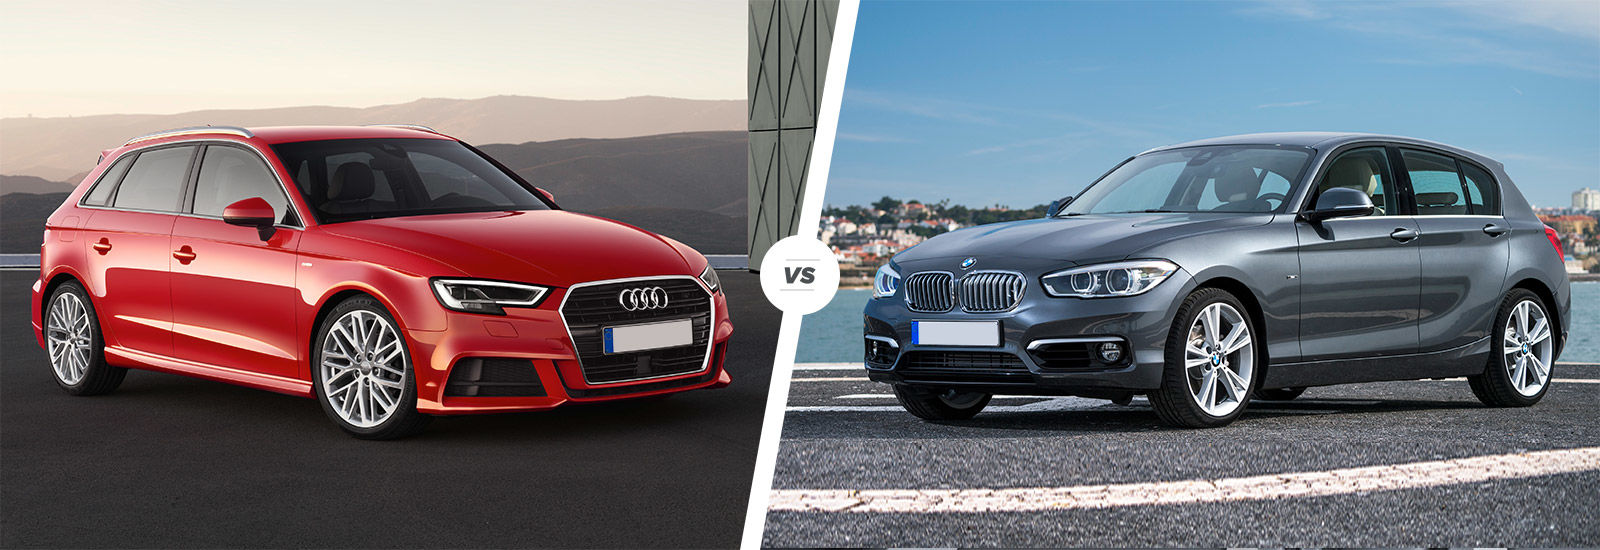 Audi a3 vs bmw 1 series hatchback comparison carwow